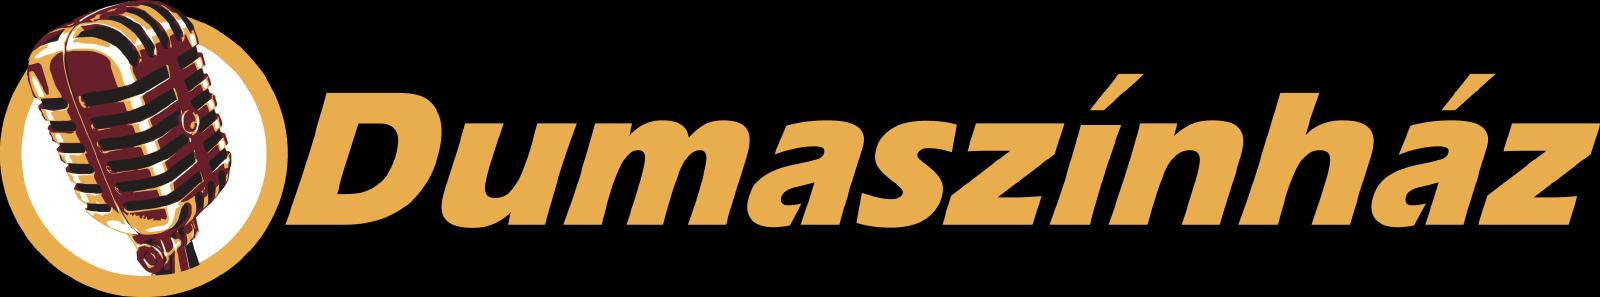 dumaszinhaz_vektoros logo.png